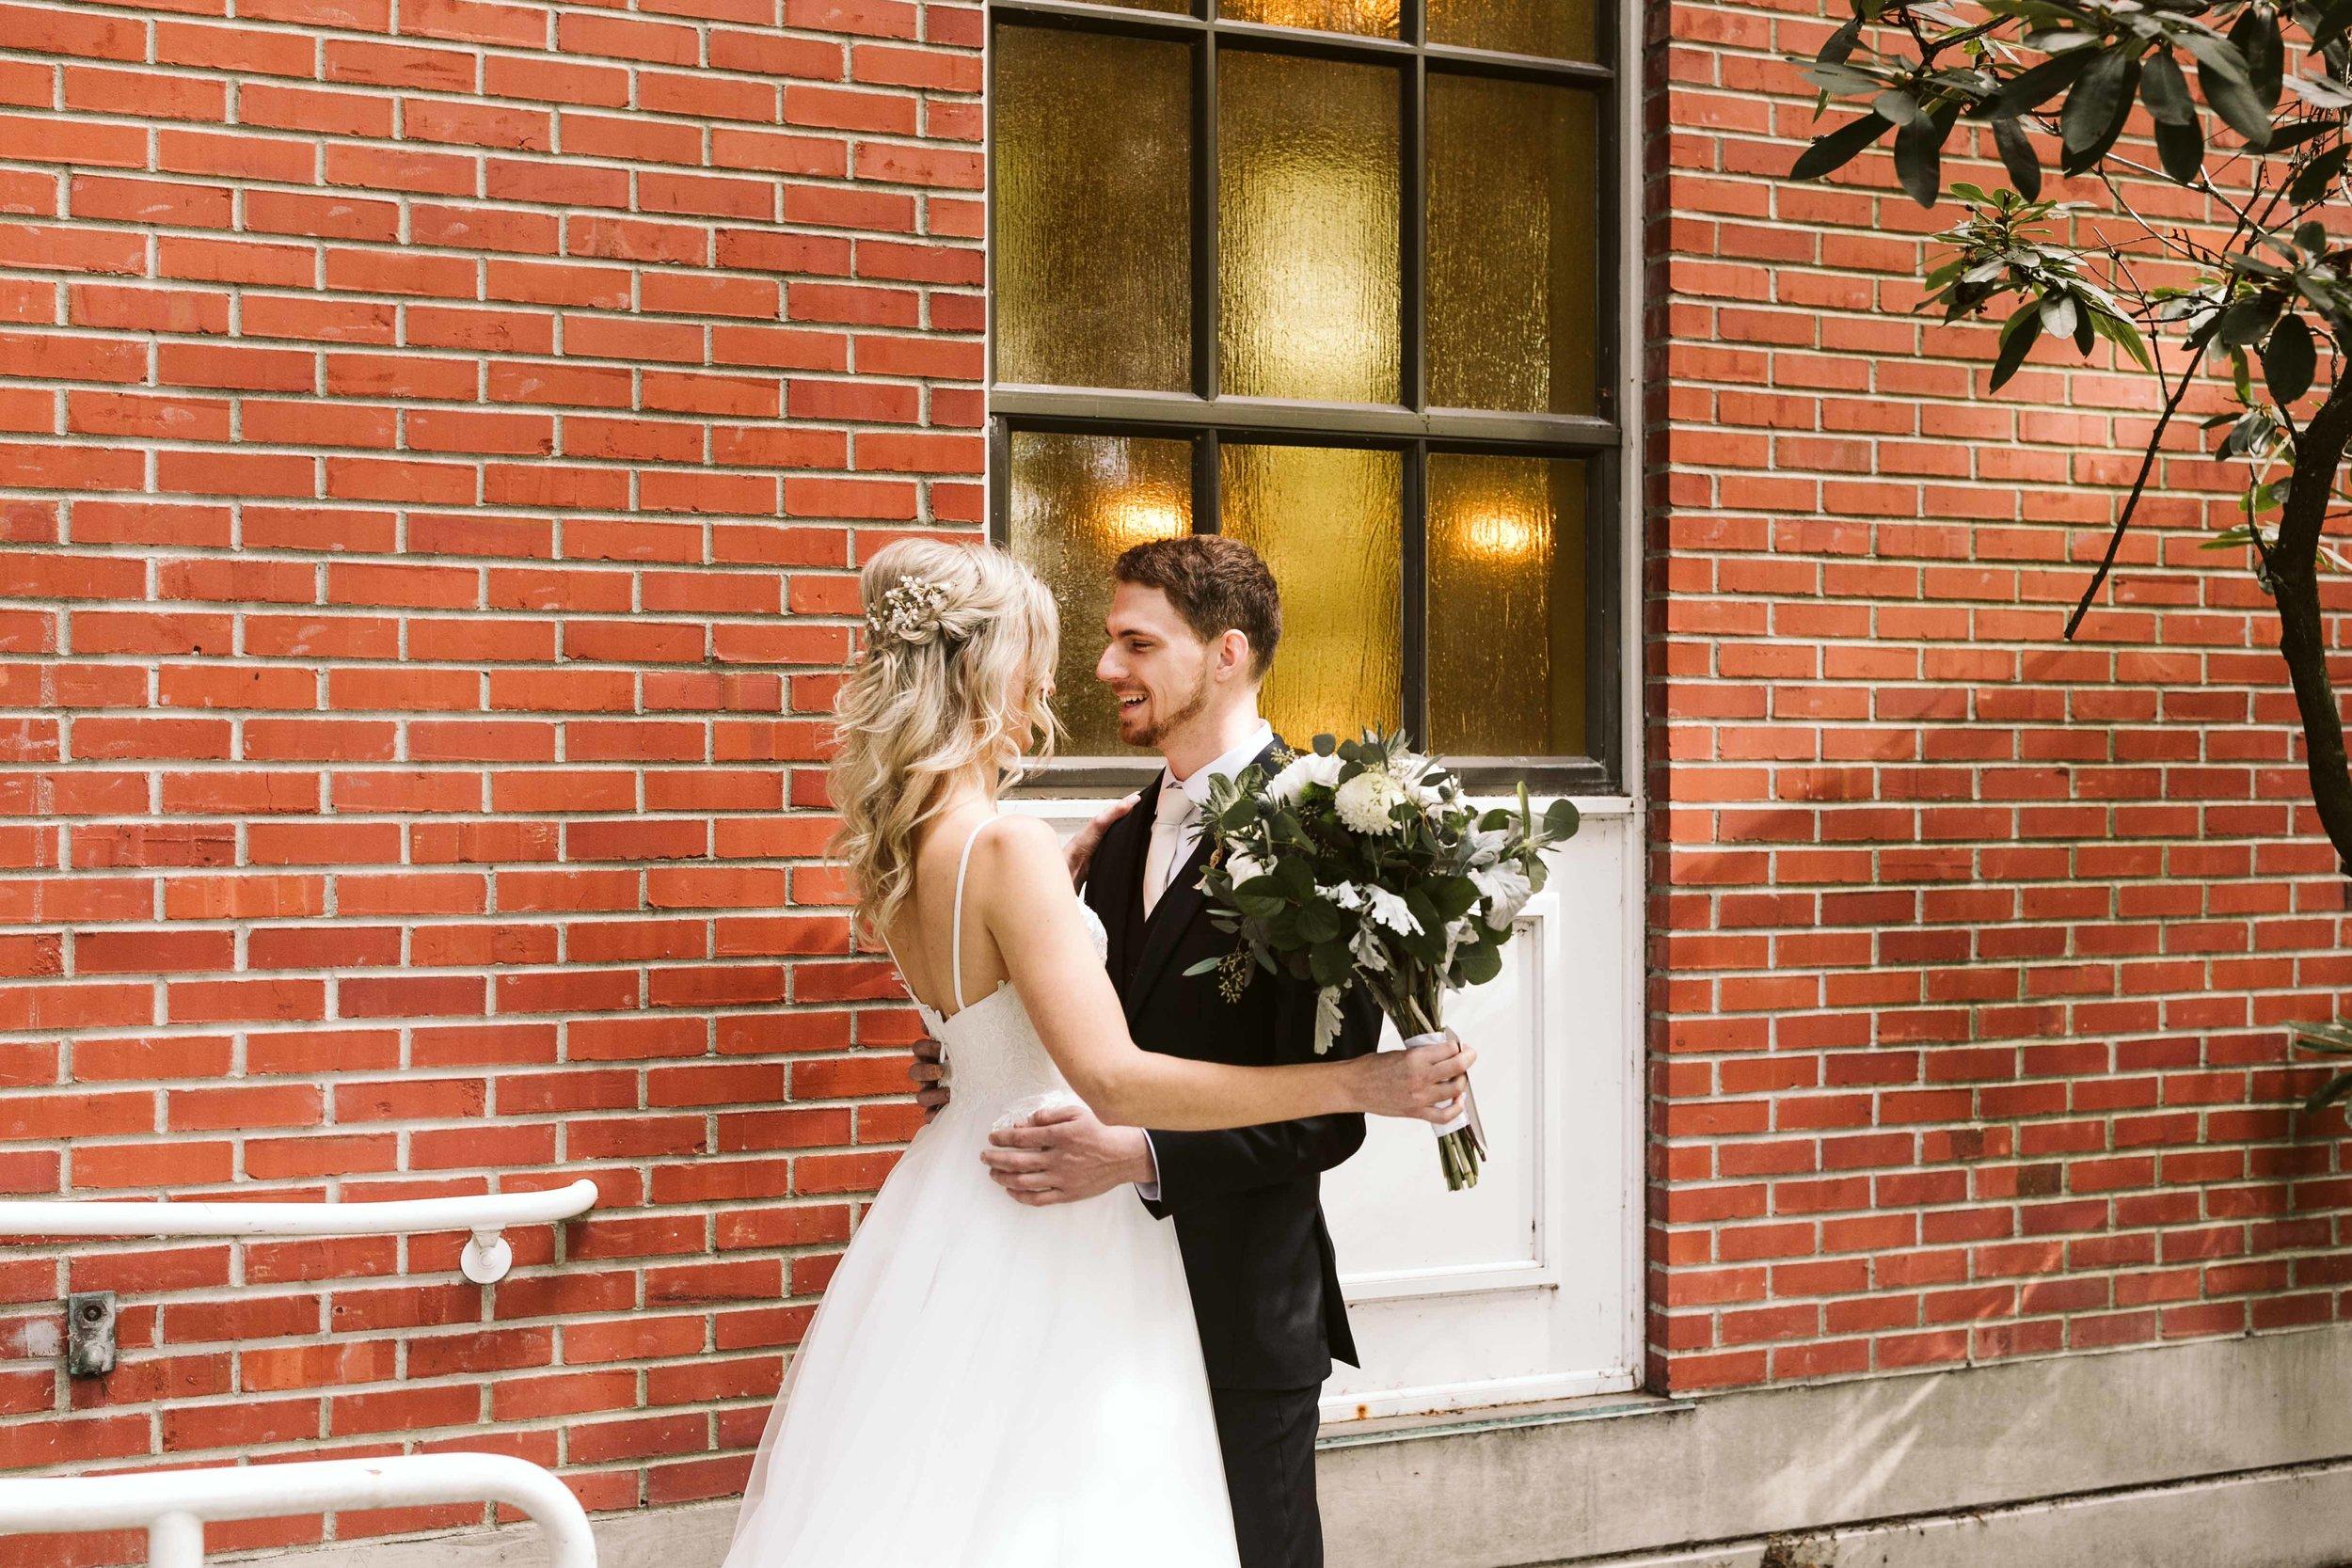 kilworth-memorial-chapel-wedding-22.jpg